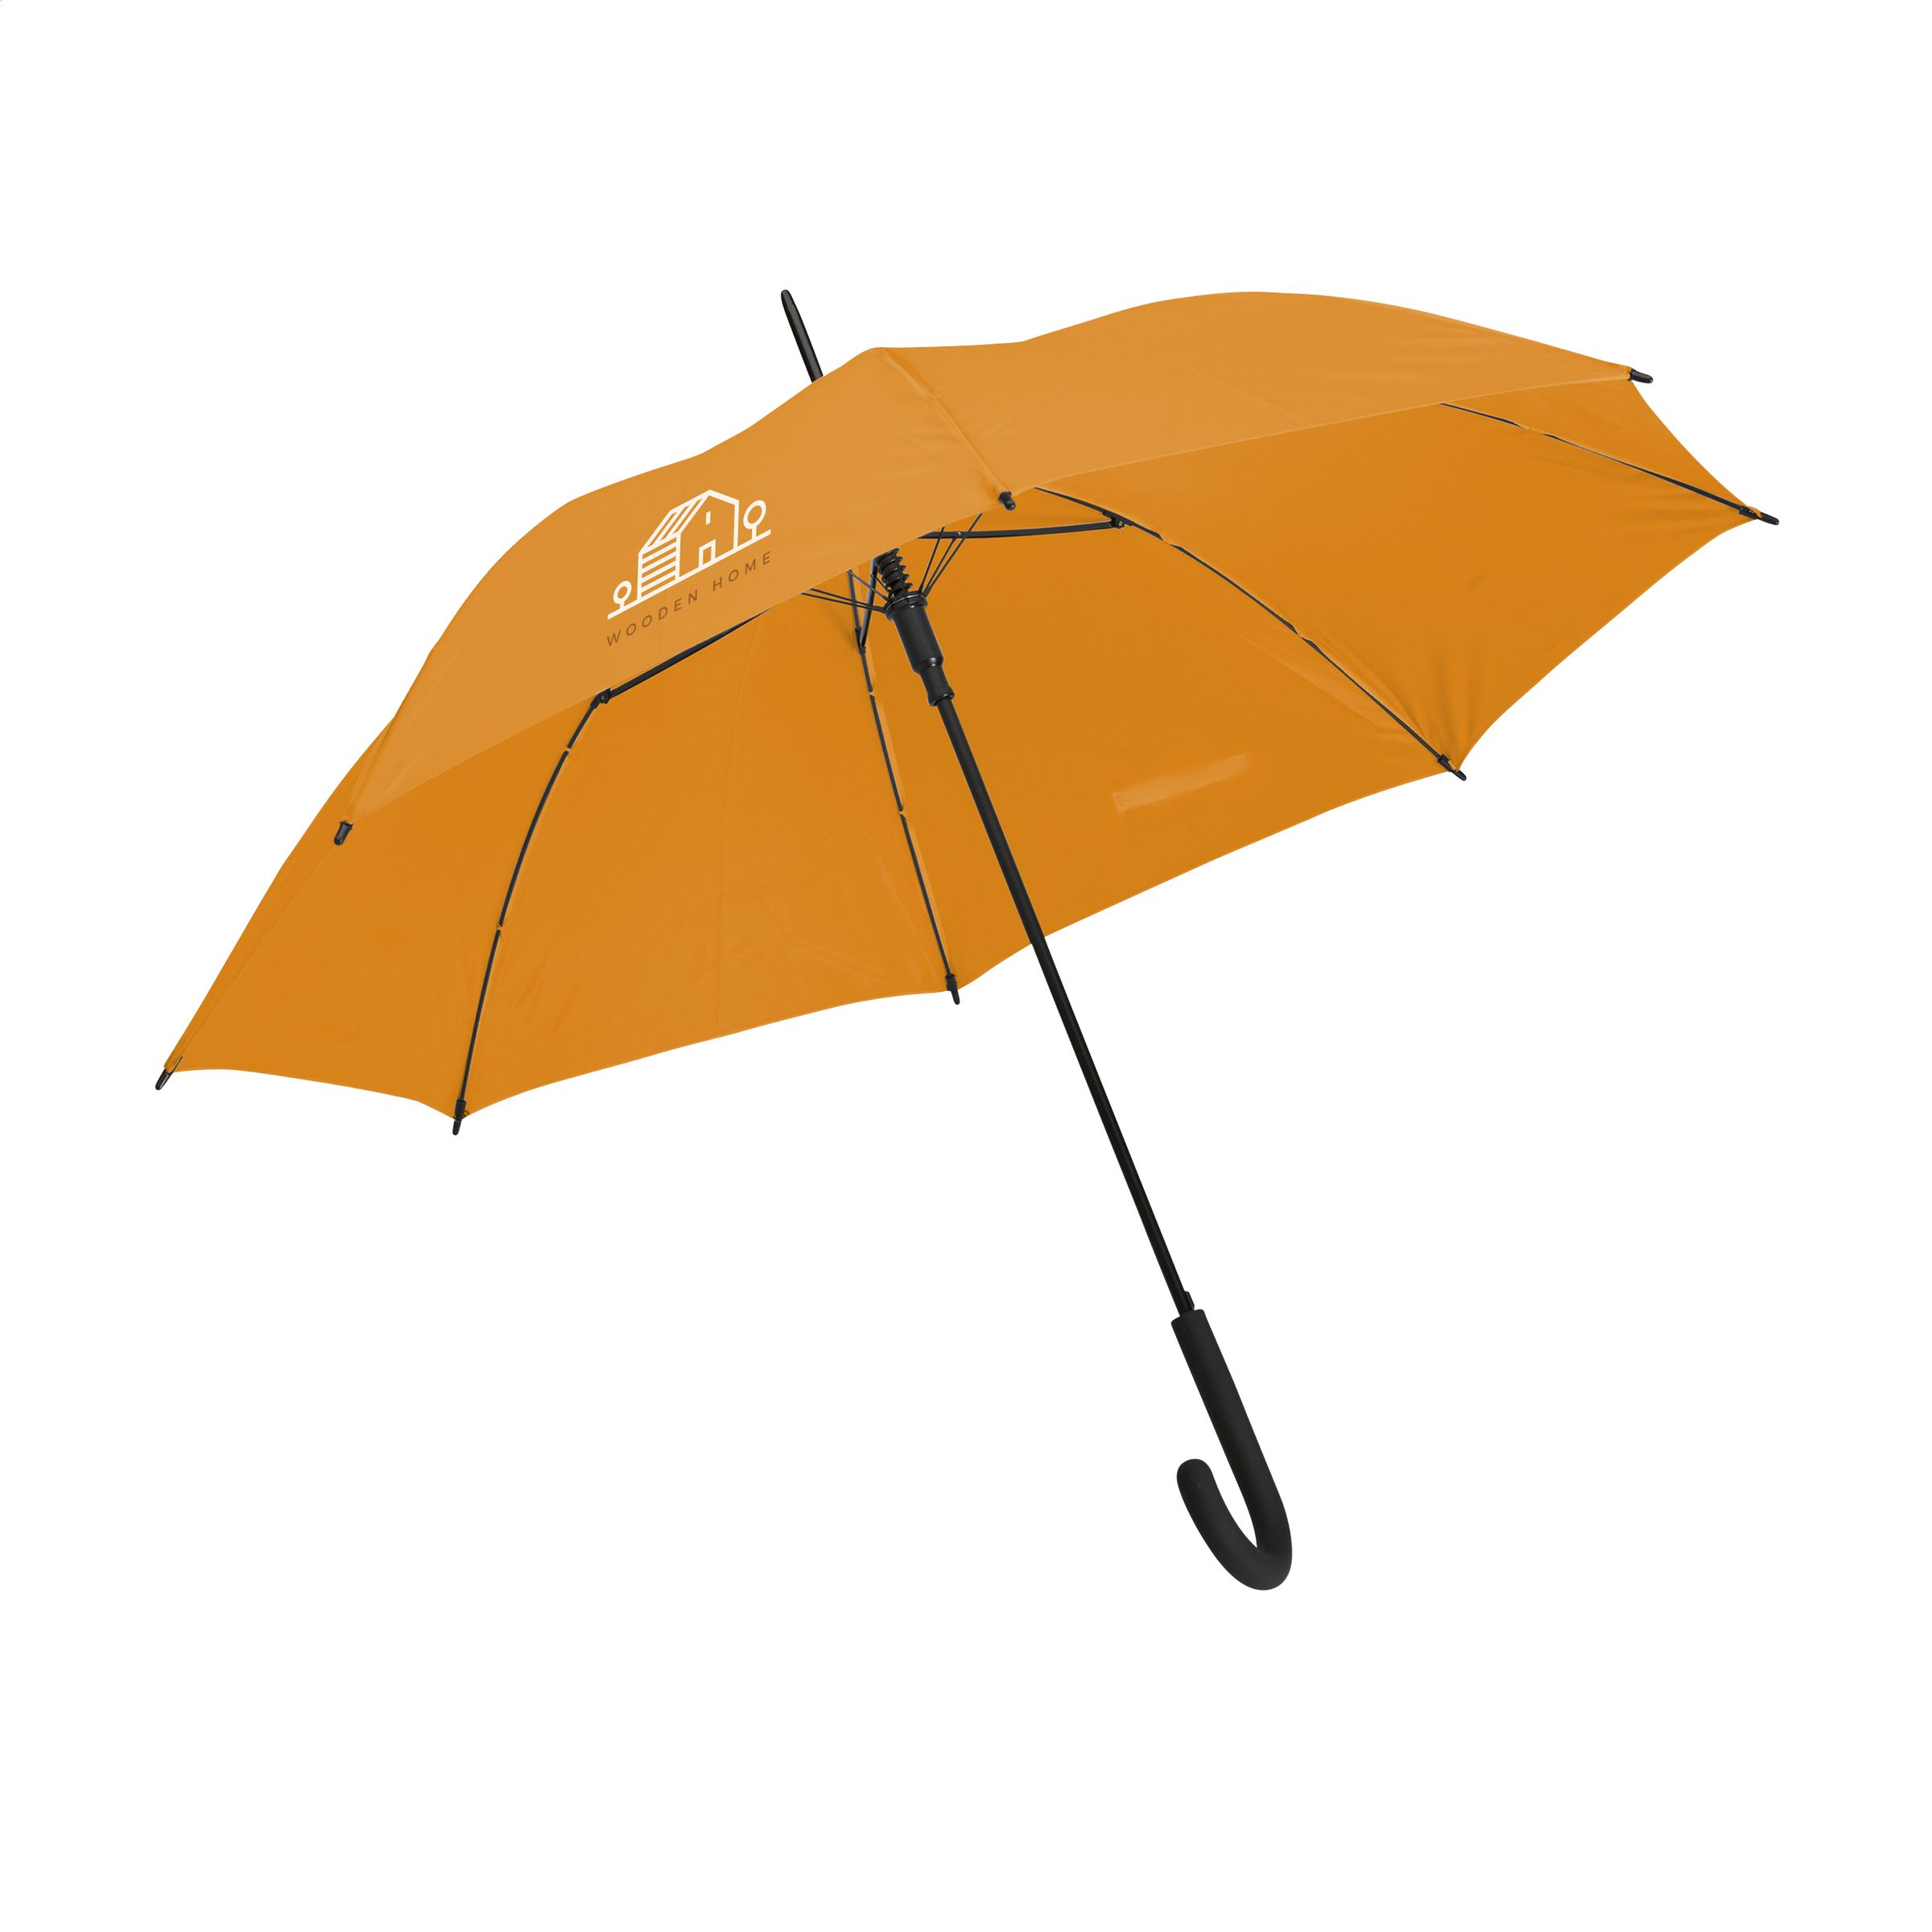 Colorado Classic automatische paraplu